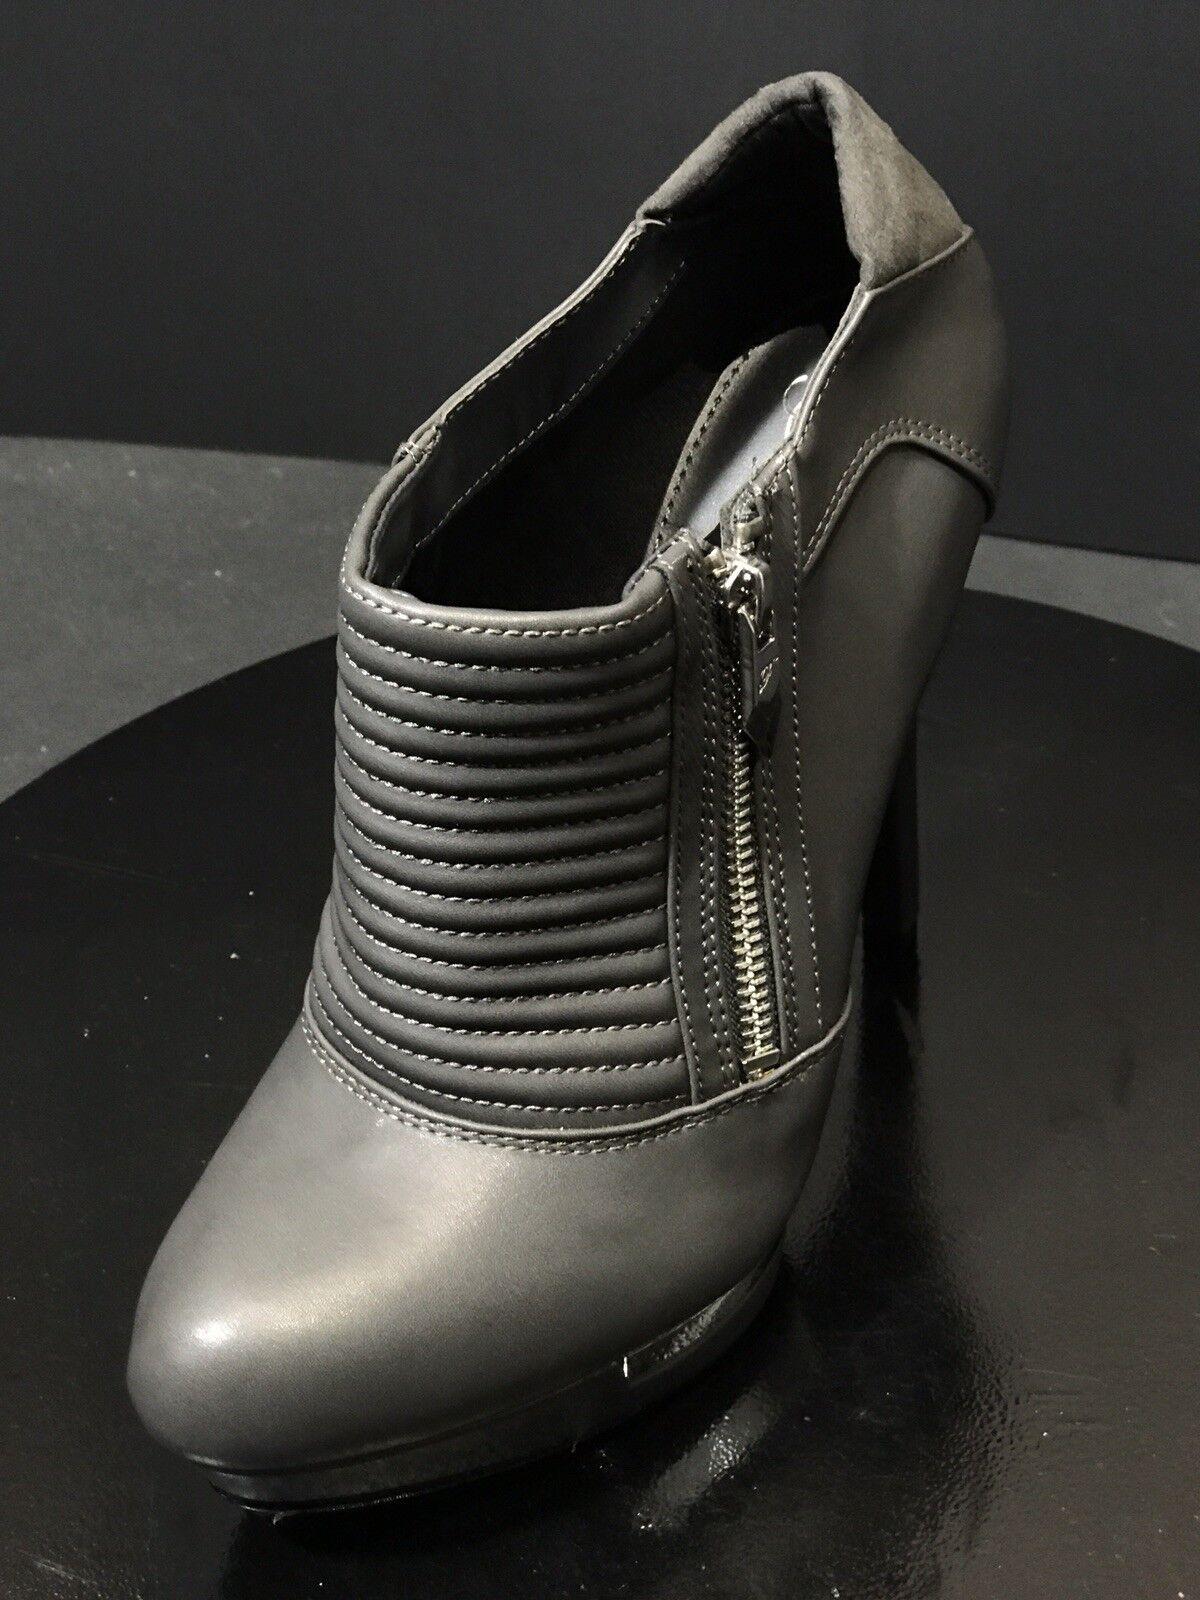 ordina ora i prezzi più bassi New Fergie Wander Wander Wander Donna  Dress Pump Heels grigio Colore avvioies Dimensione US 8.5 M  wholesape economico